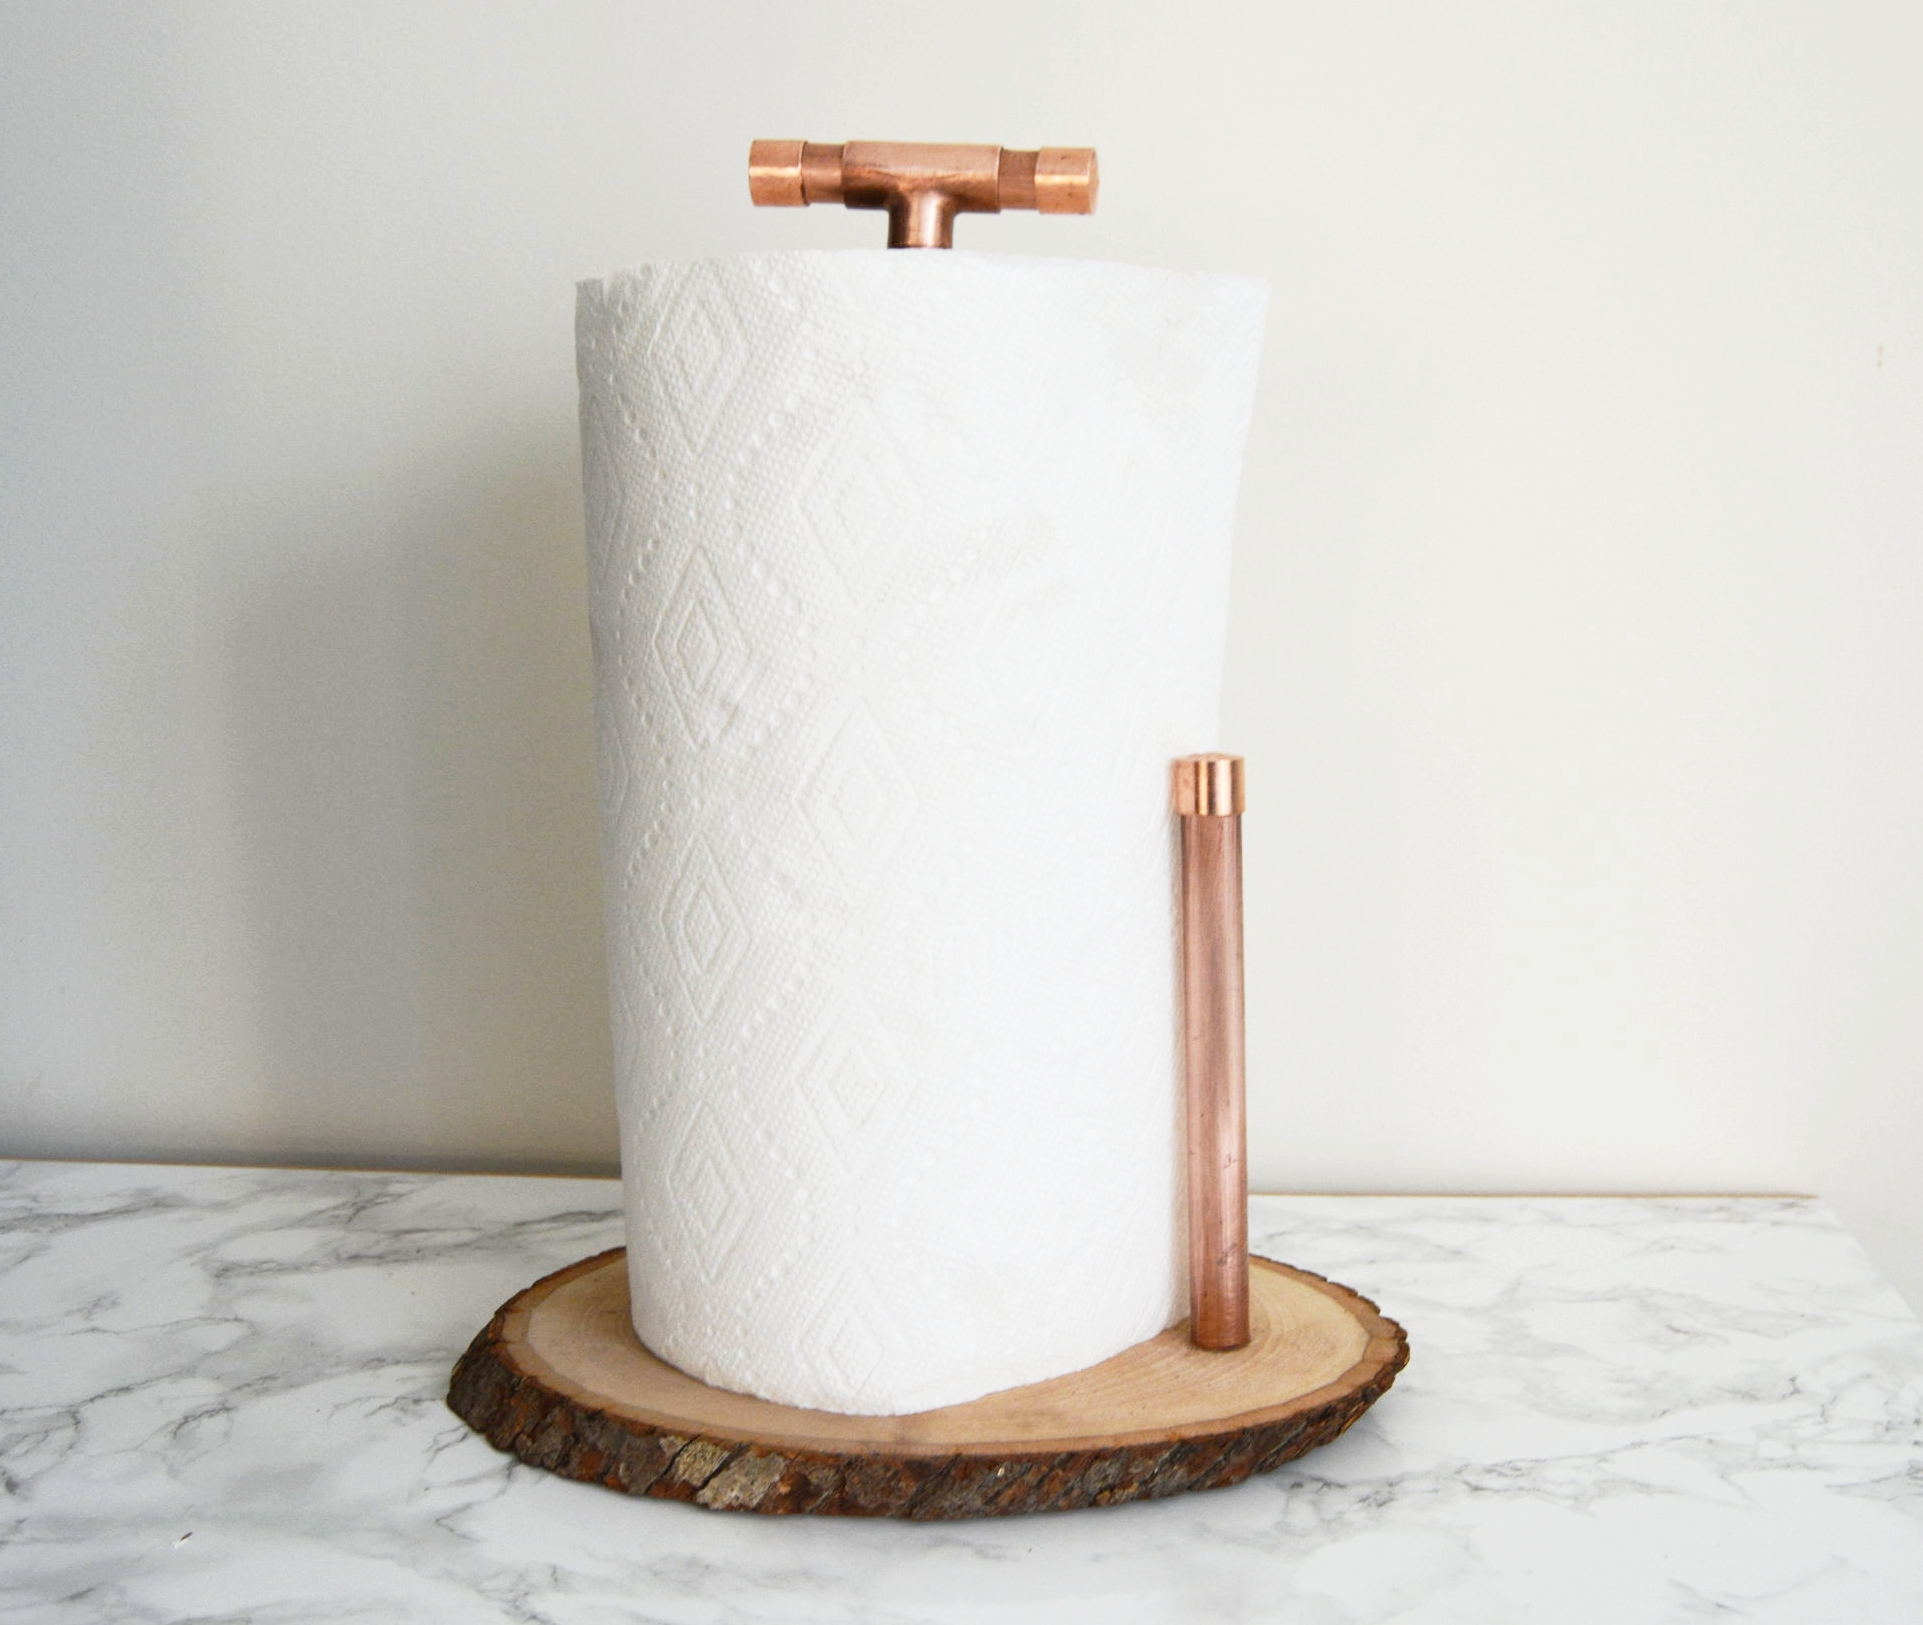 Diy Copper And Wood Paper Towel Holder Recess